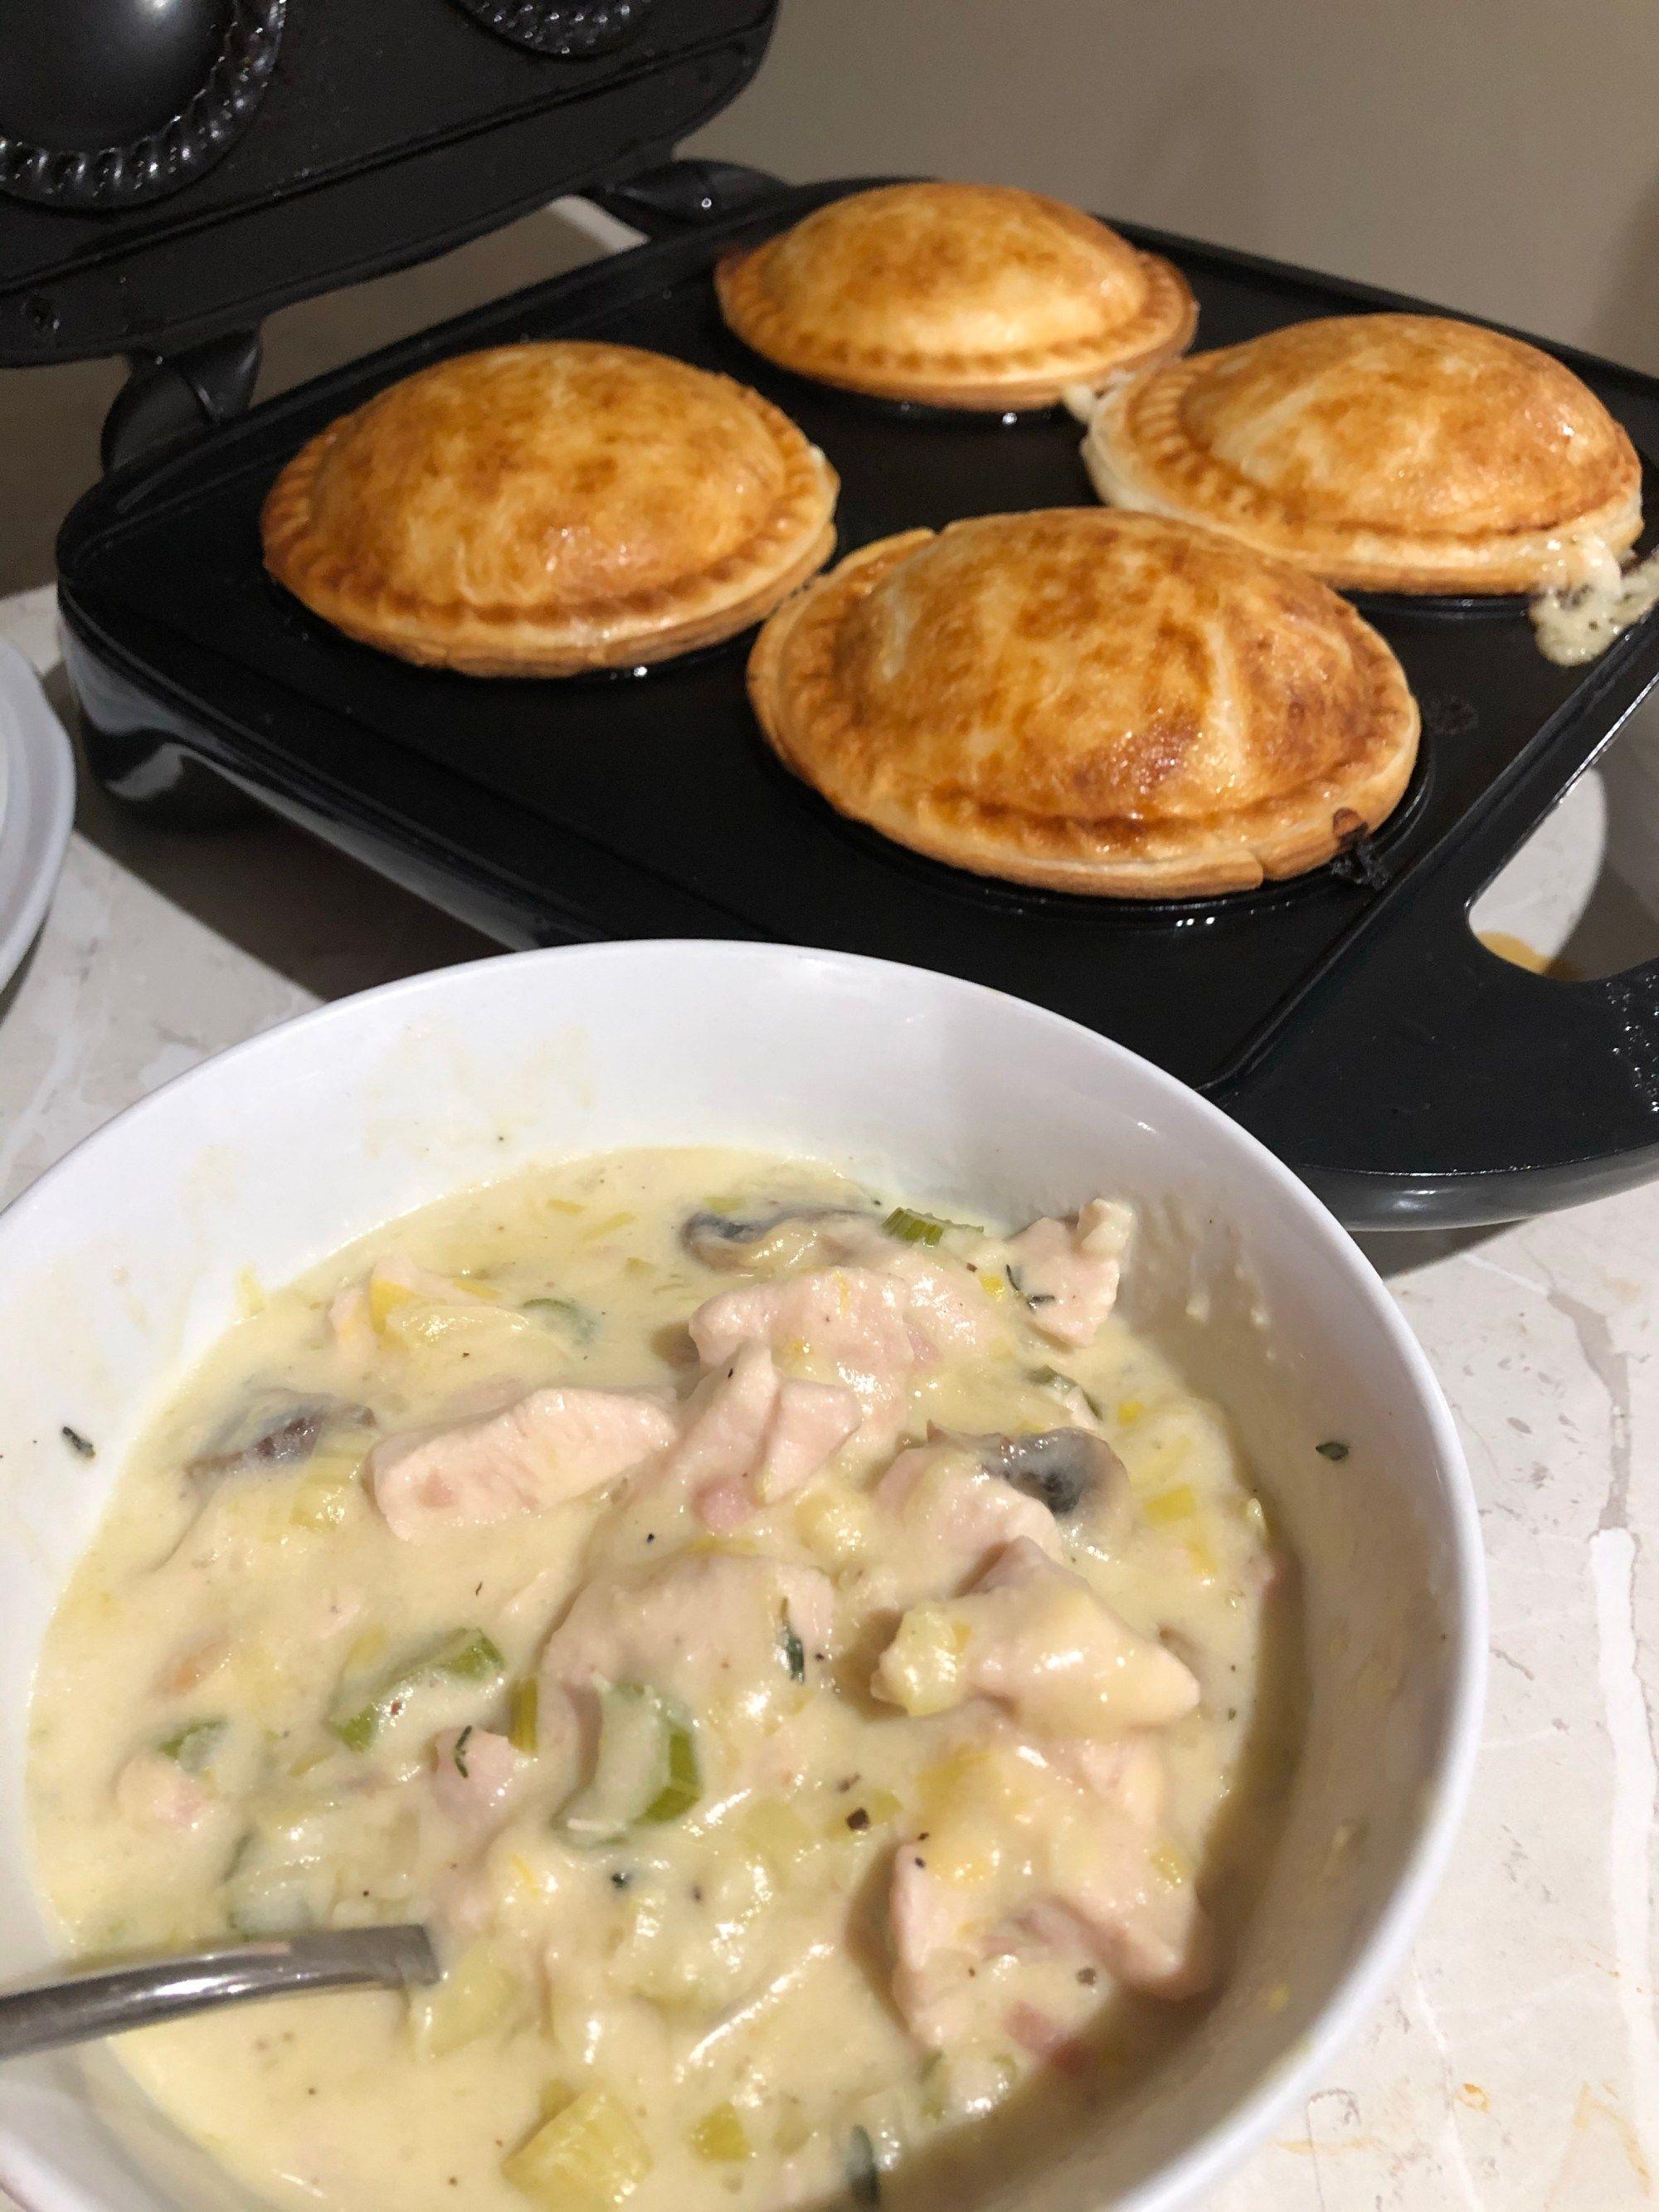 Creamy Chicken Leek Bacon Mushroom Pies Foodie Mumma Ren Chicken And Leak Pie Chicken And Leek Pie Bacon Stuffed Mushrooms